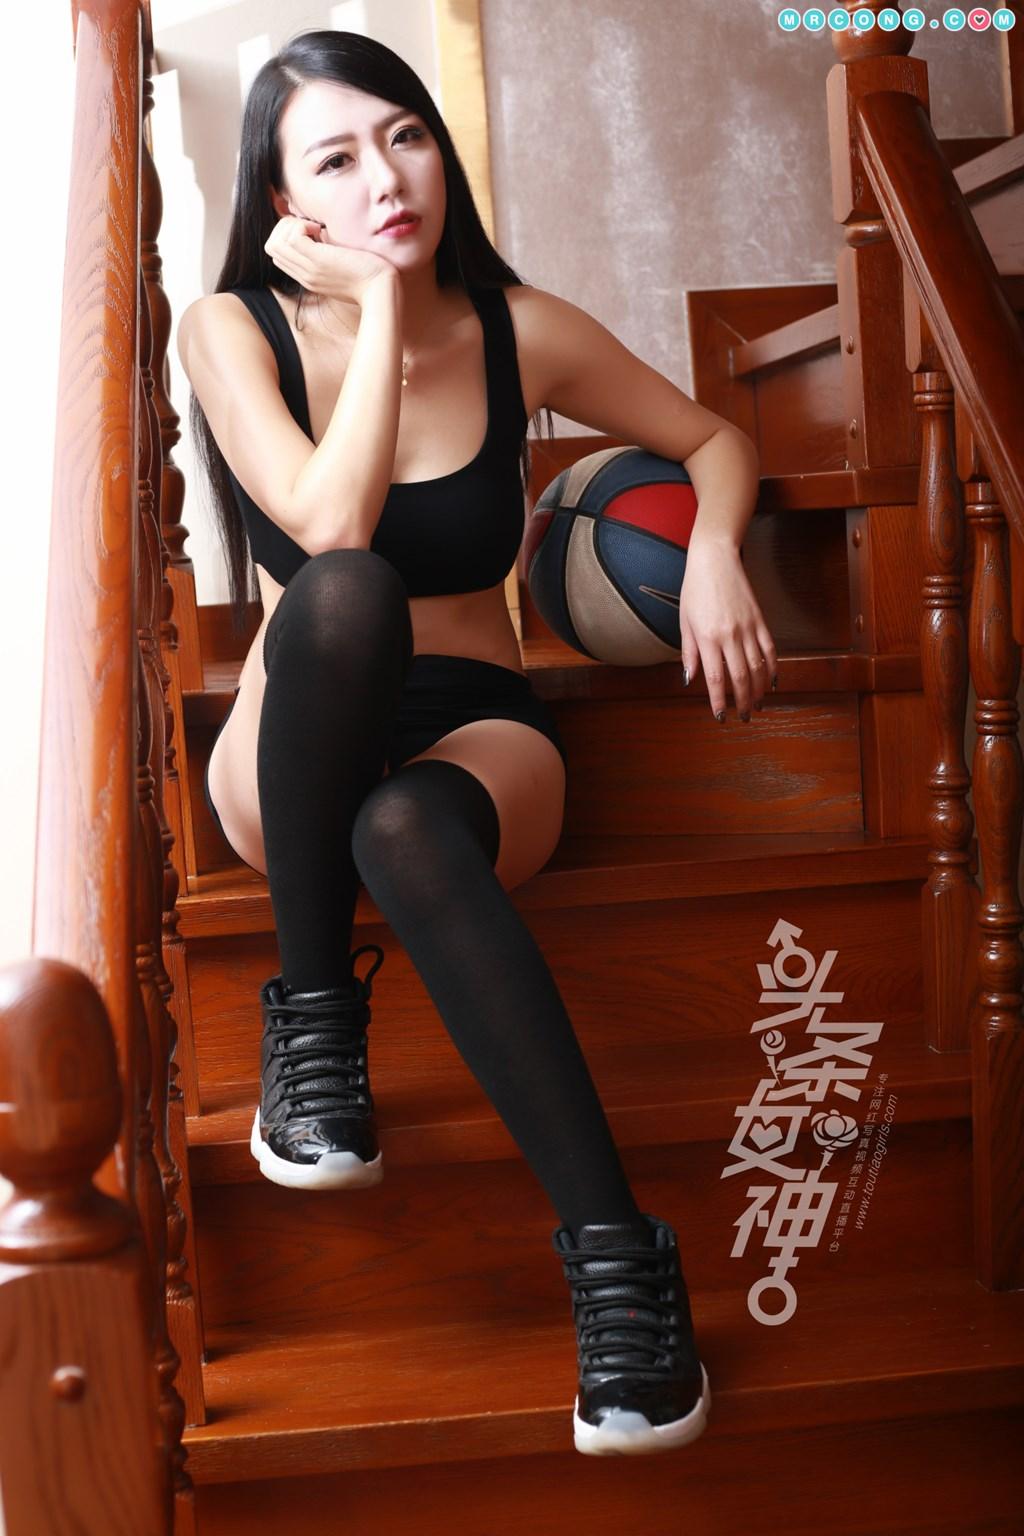 Image TouTiao-2018-02-24-Dan-Dan-MrCong.com-037 in post TouTiao 2018-02-24: Người mẫu Dan Dan (丹丹) (44 ảnh)